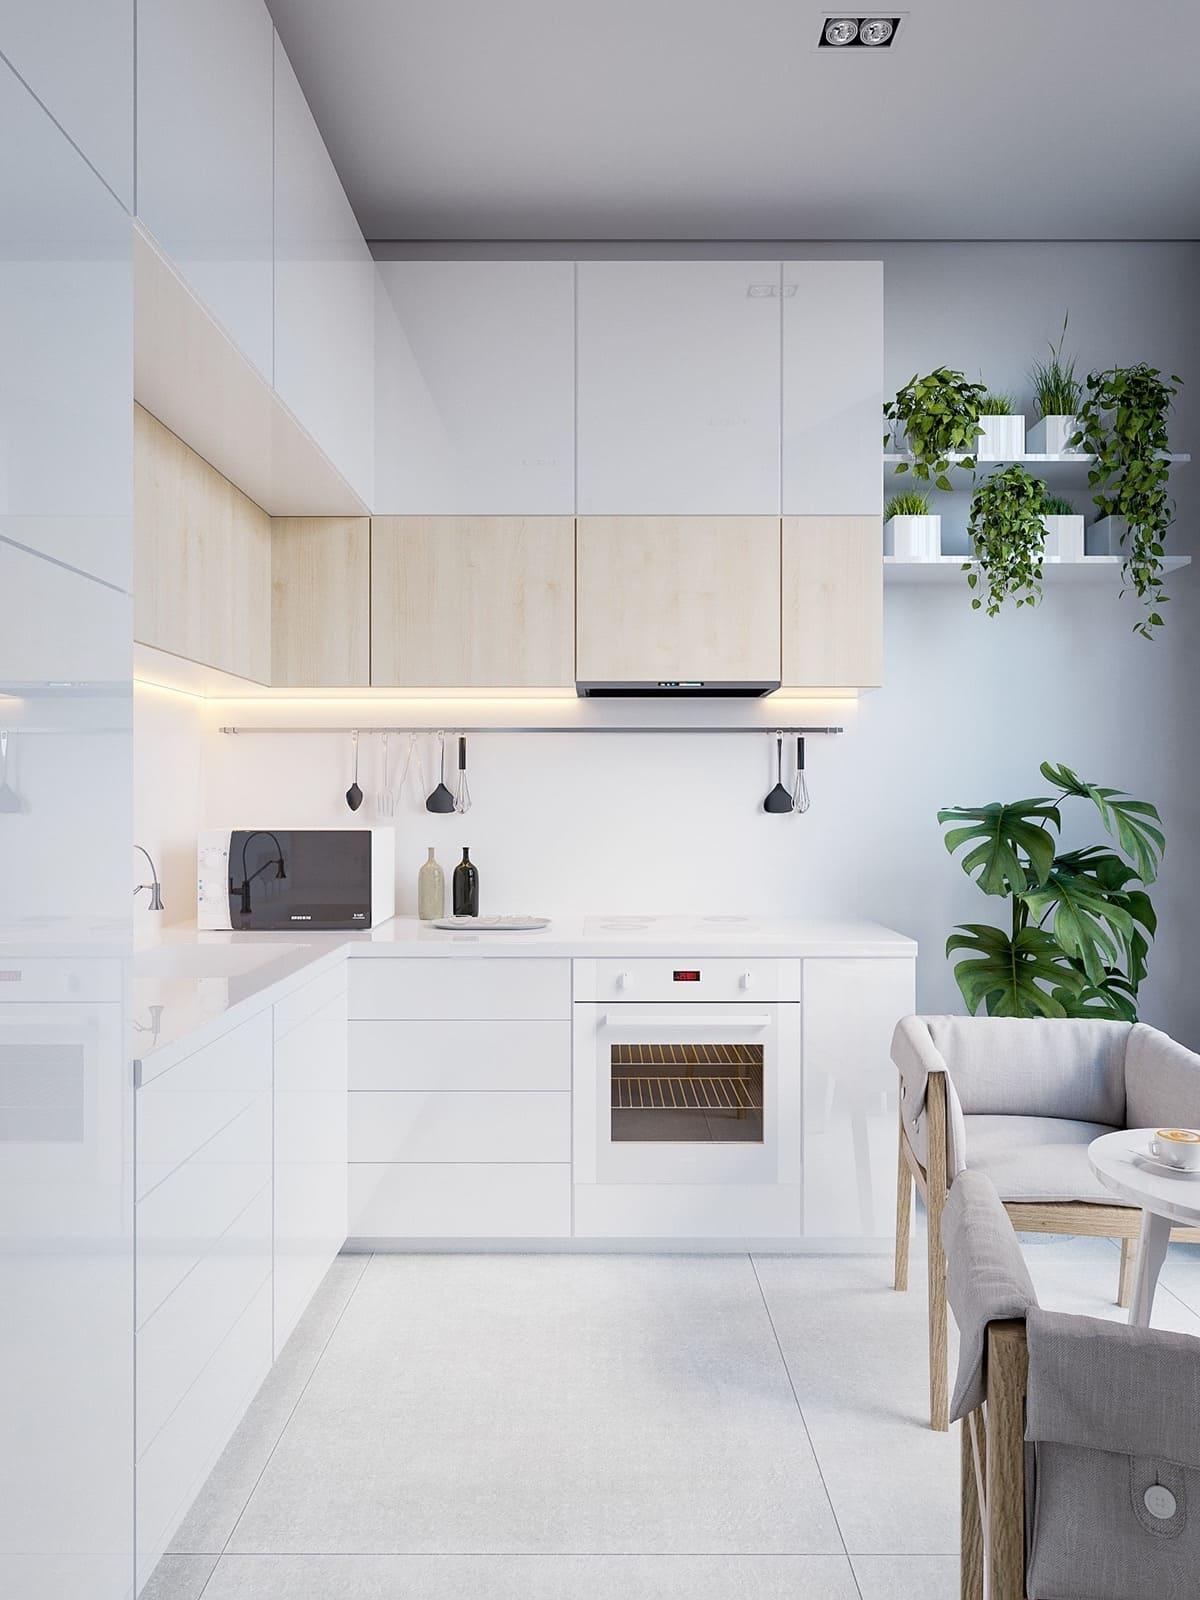 дизайн интерьера модной квартиры фото 43